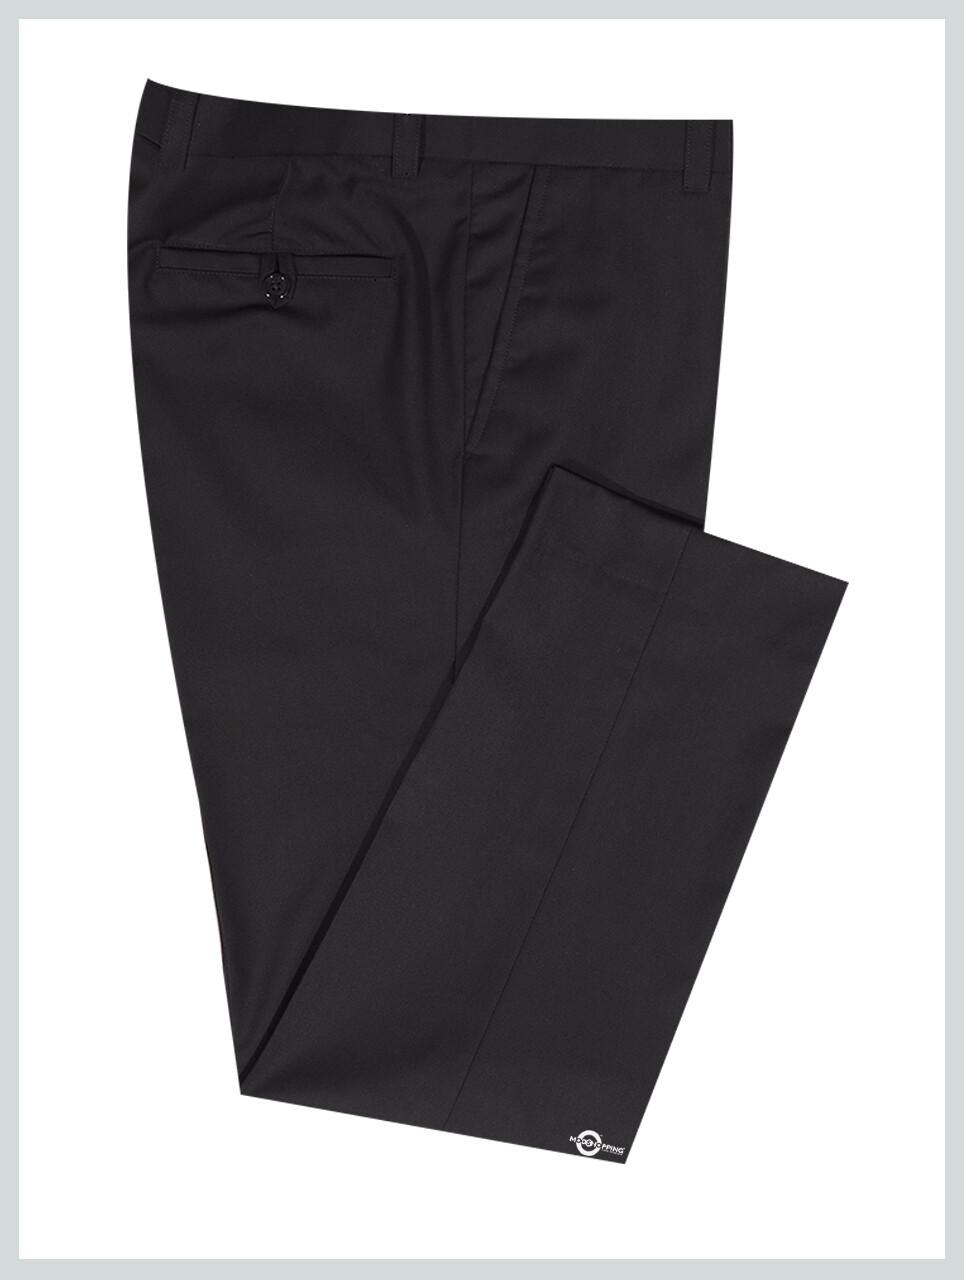 Suit Trouser| Black Trouser For Men